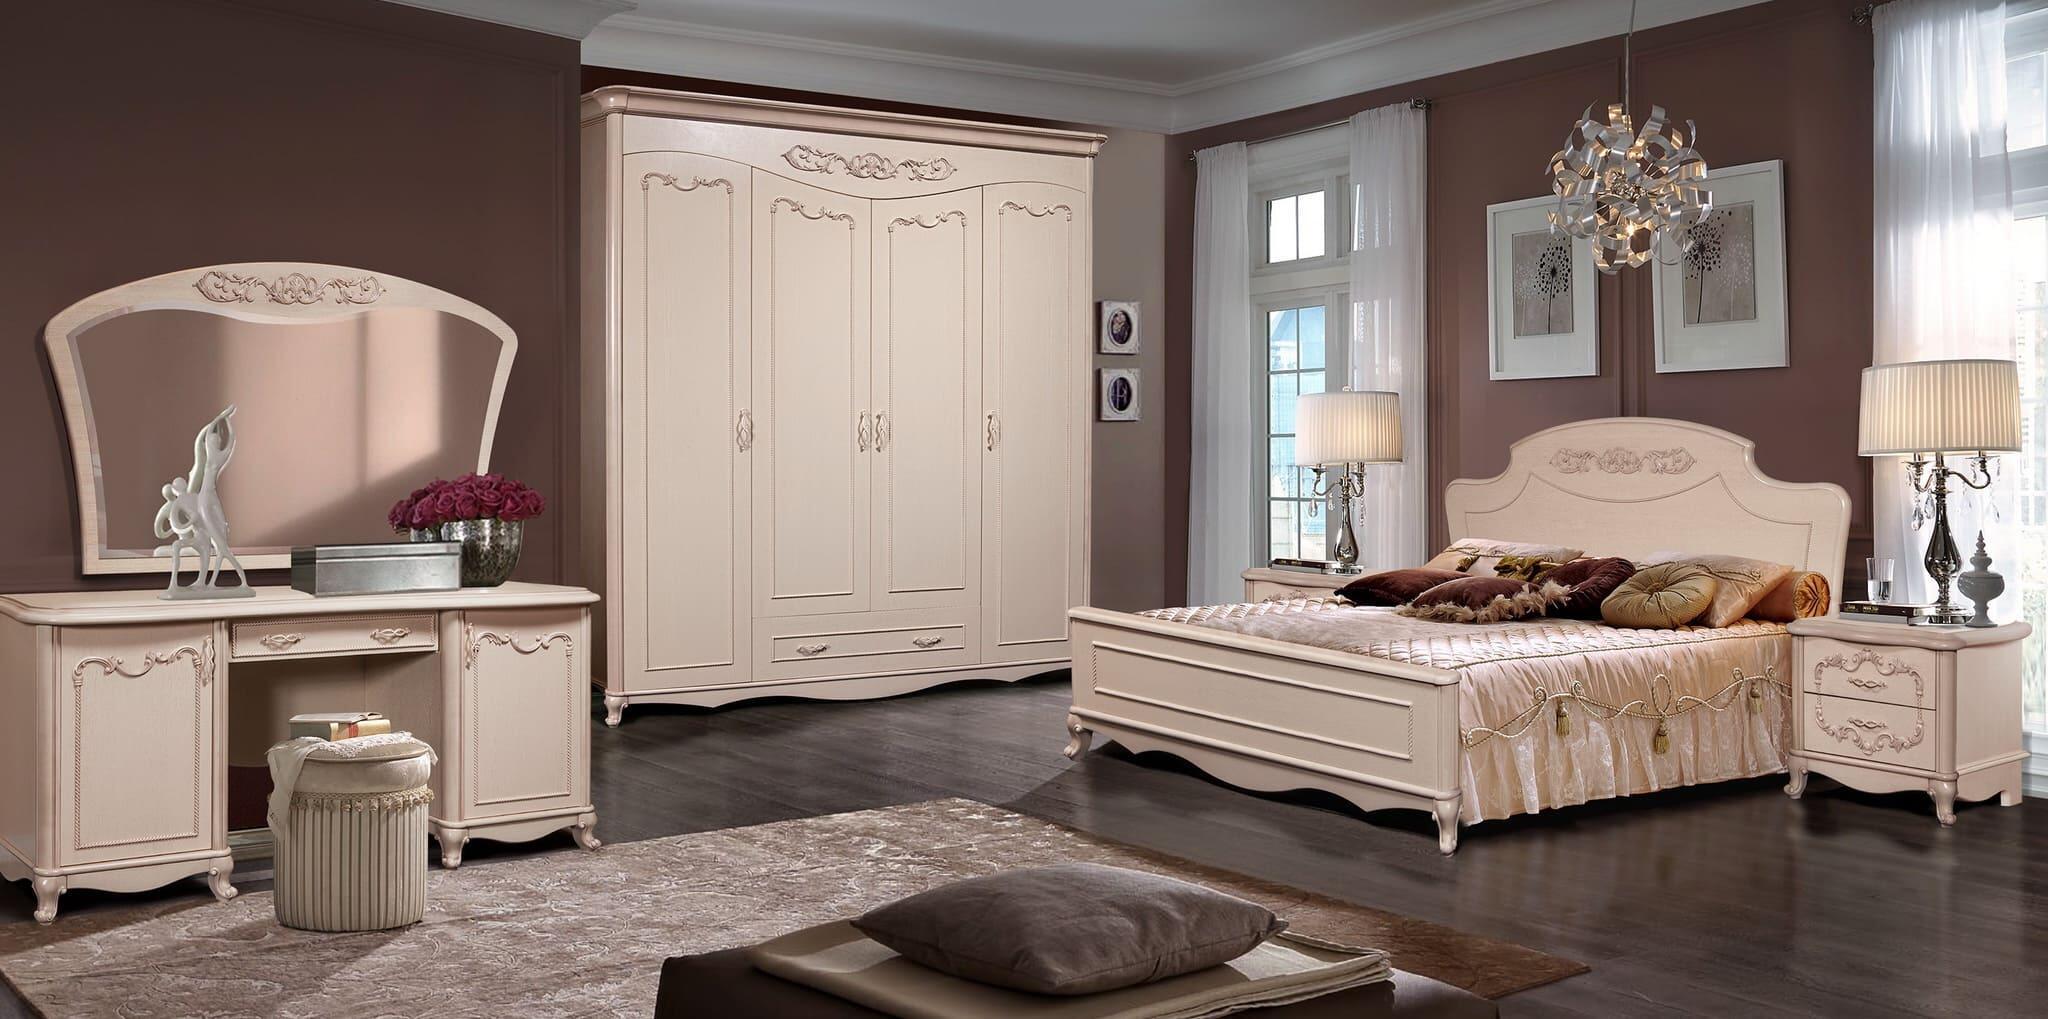 Набор мебели для спальни «Валенсия-2Д»  ГМ 8900-12 (Sale)